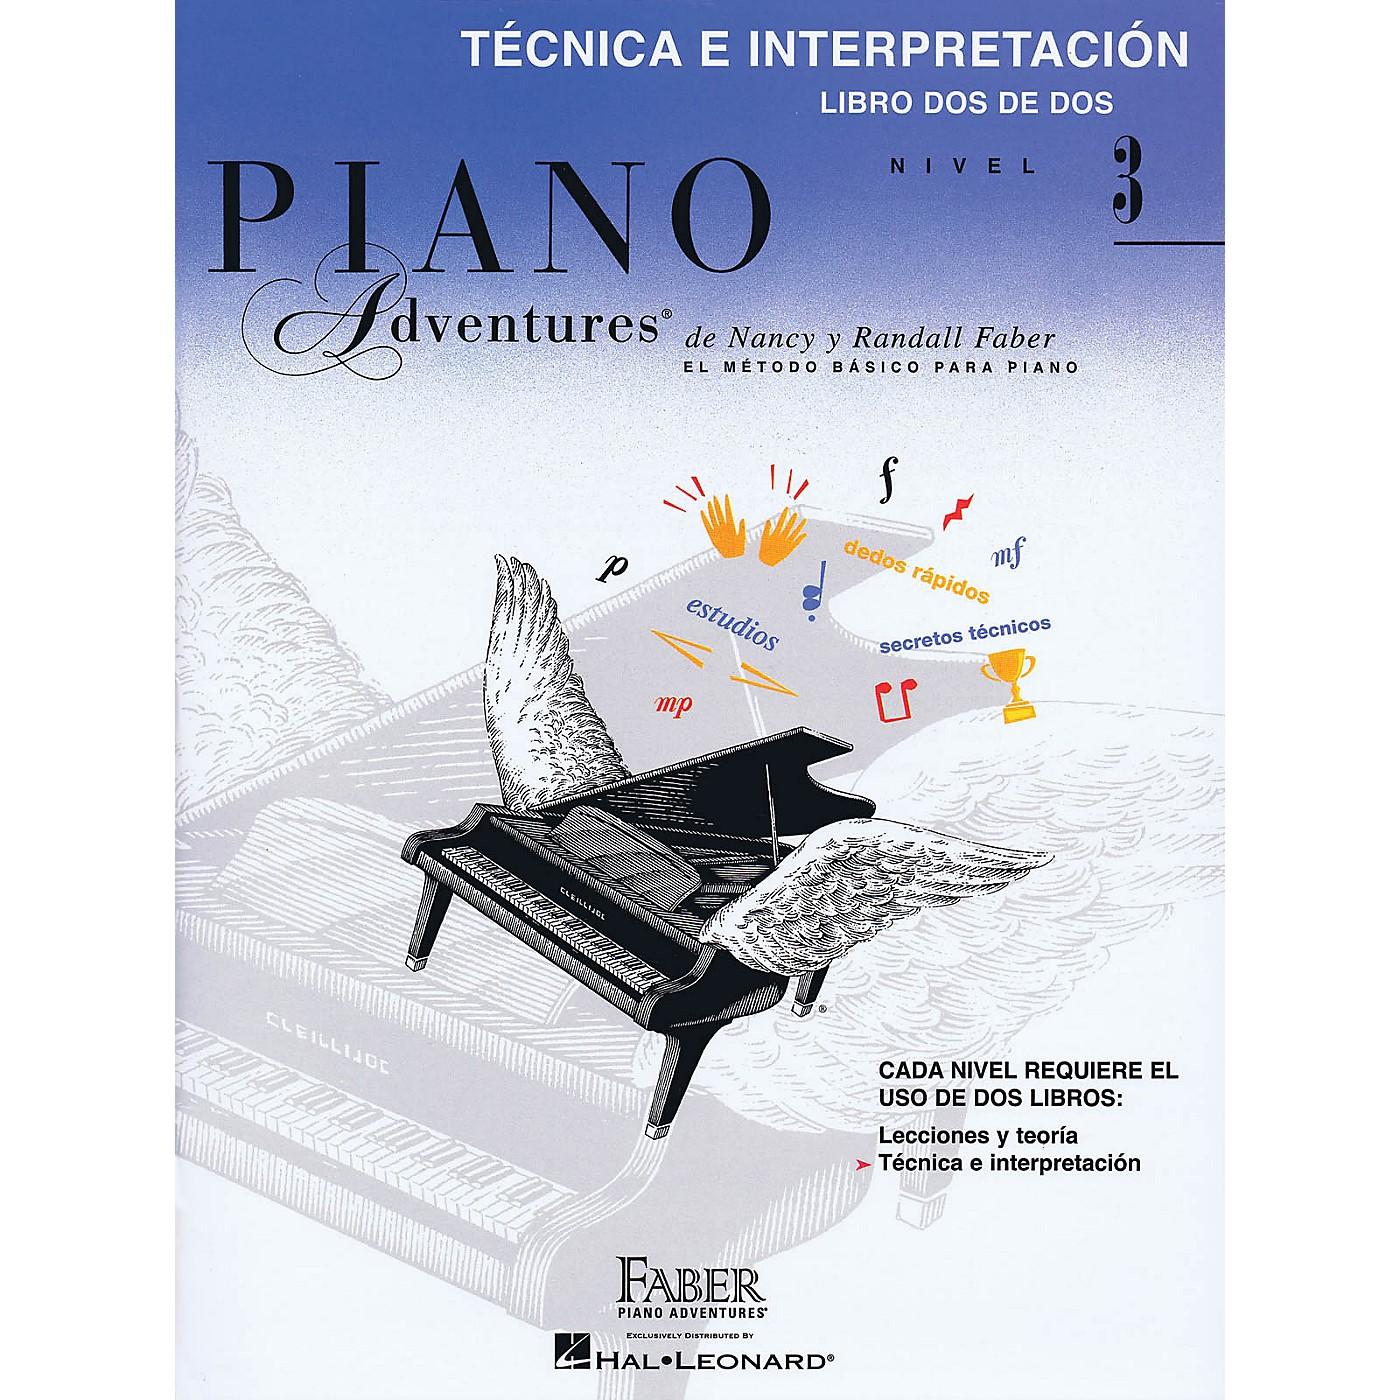 Faber Piano Adventures Tecnica E Interpretacion Libro Dos De Dos - Nivel 3 Faber Piano Adventures Softcover by Nancy Faber thumbnail